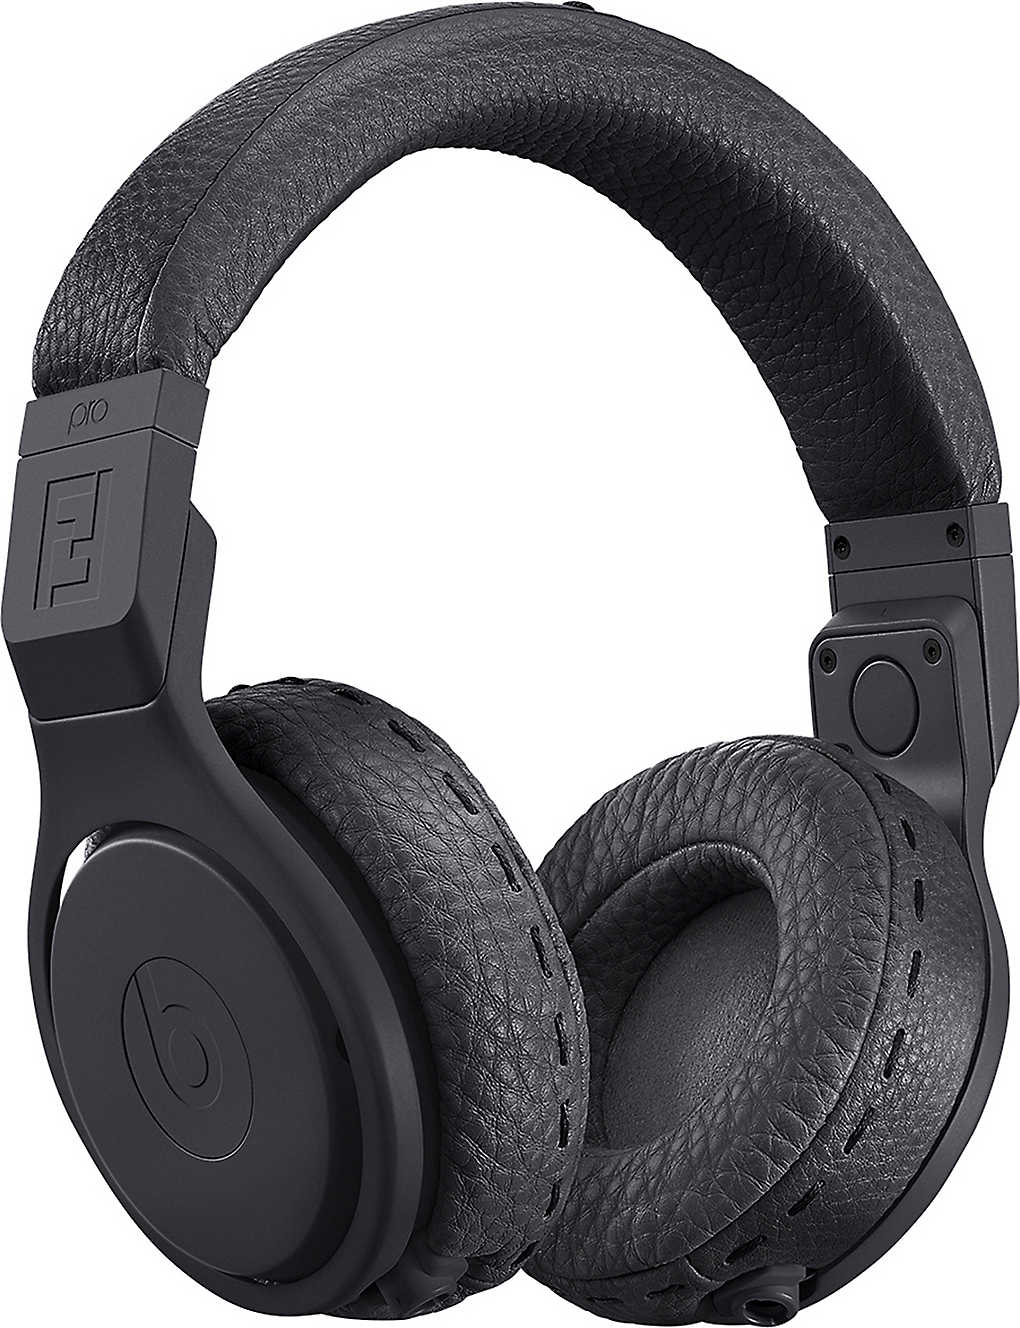 Beats By Dre X Fendi Pro Over Ear Headphones Selfridges Com